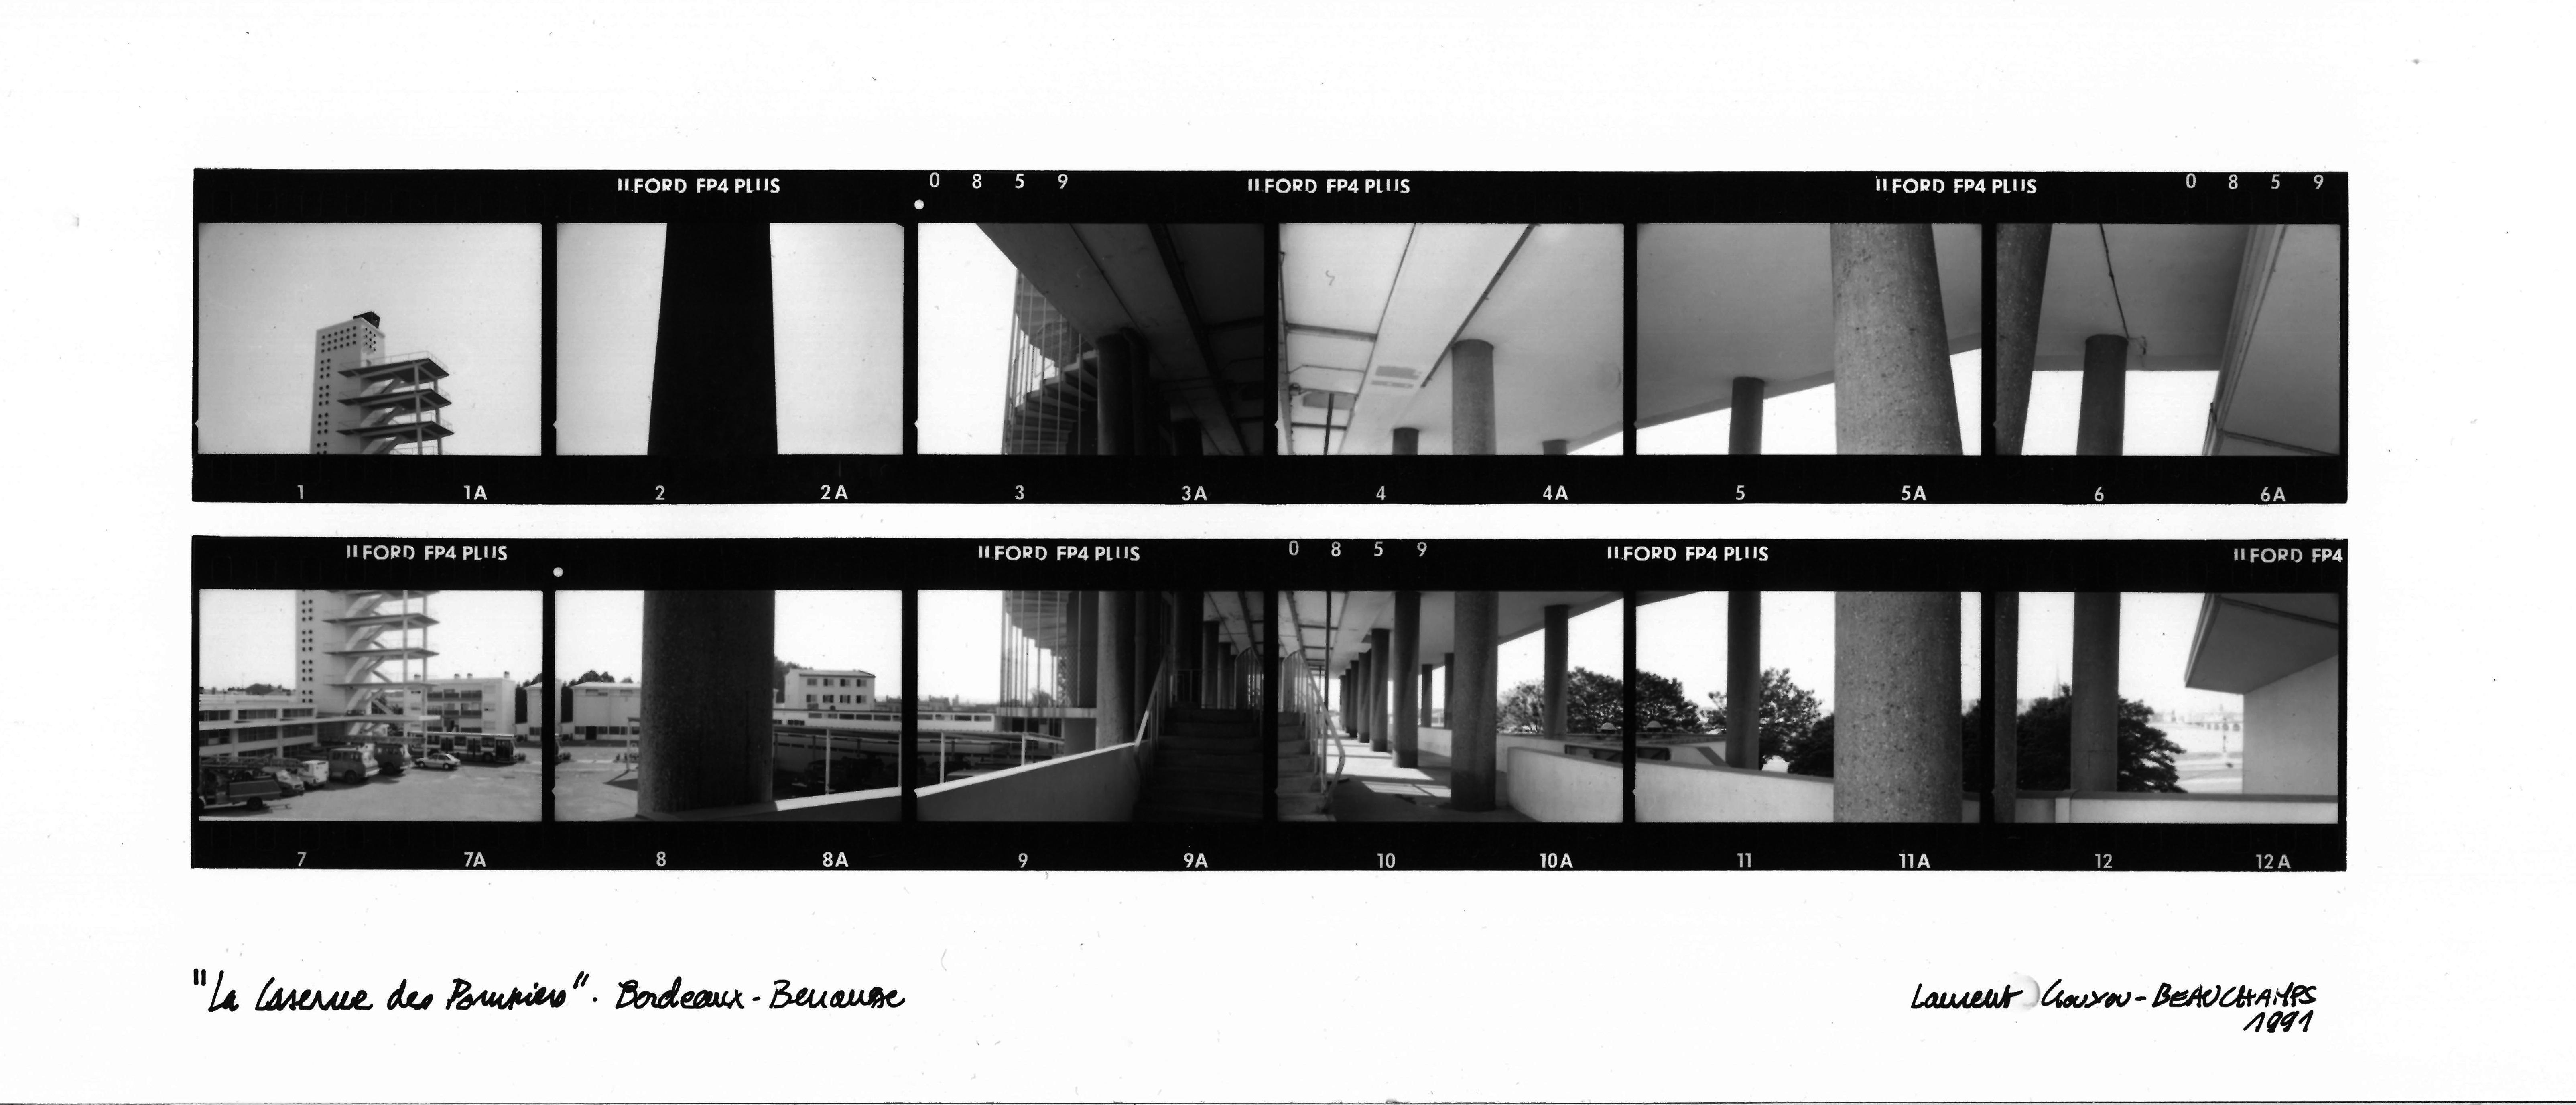 Caserne02.jpg